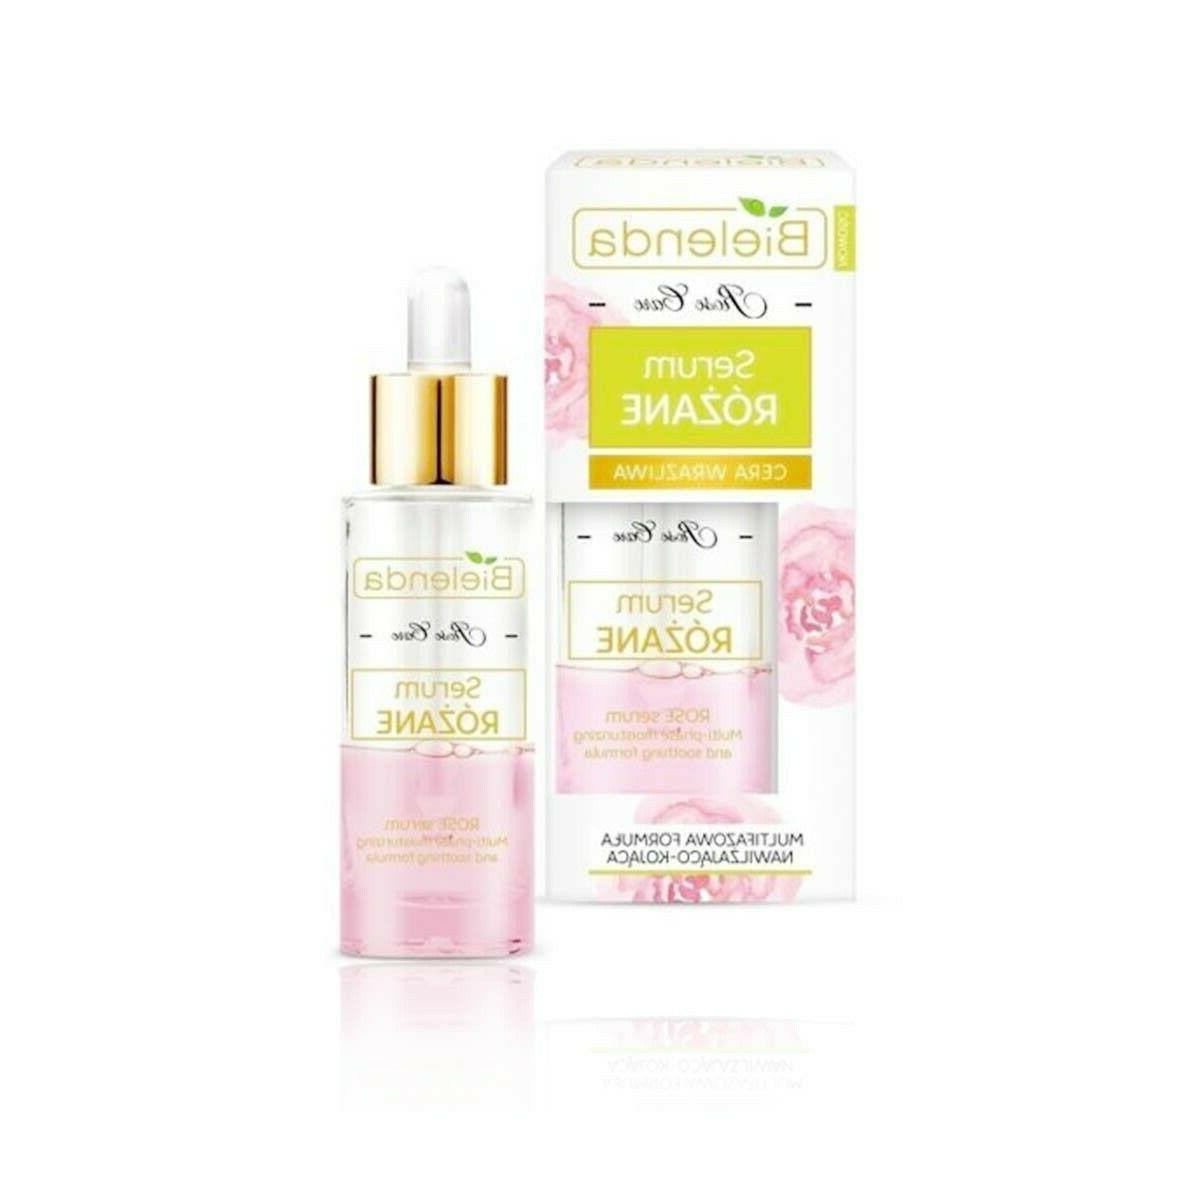 moisturizing rose face serum with rosehip oil